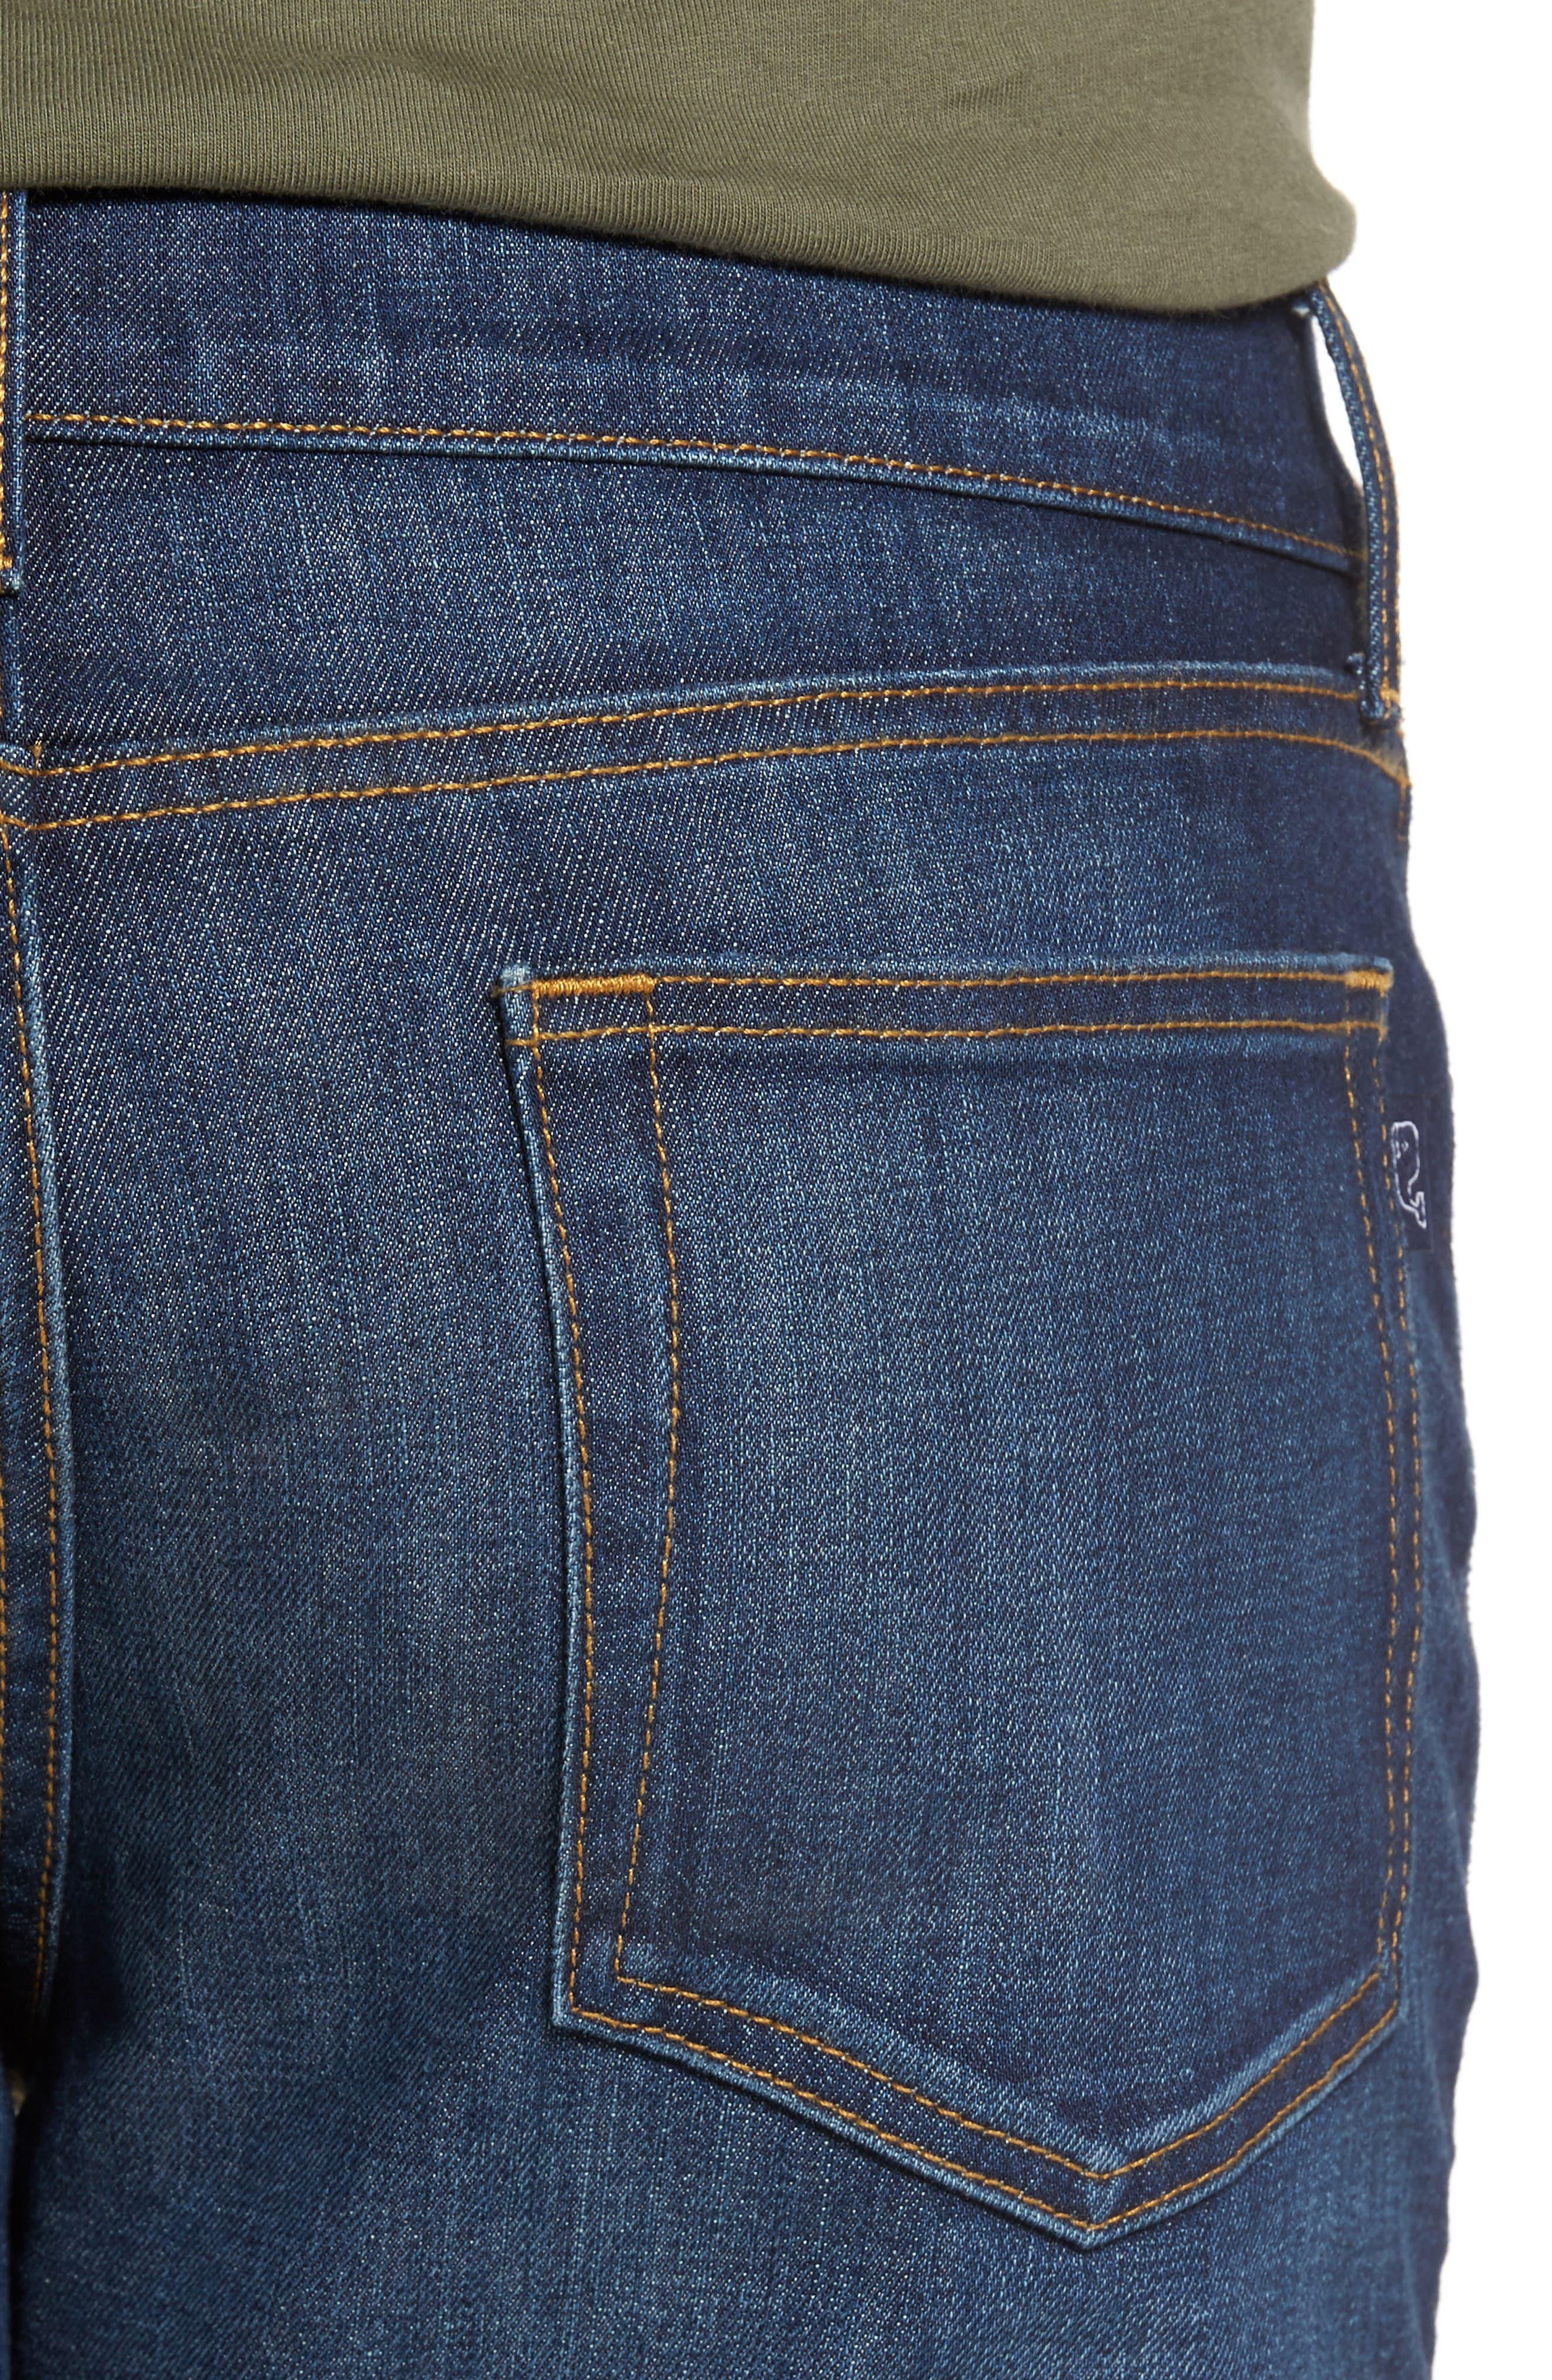 Slim Straight Leg Jeans,                             Alternate thumbnail 4, color,                             496